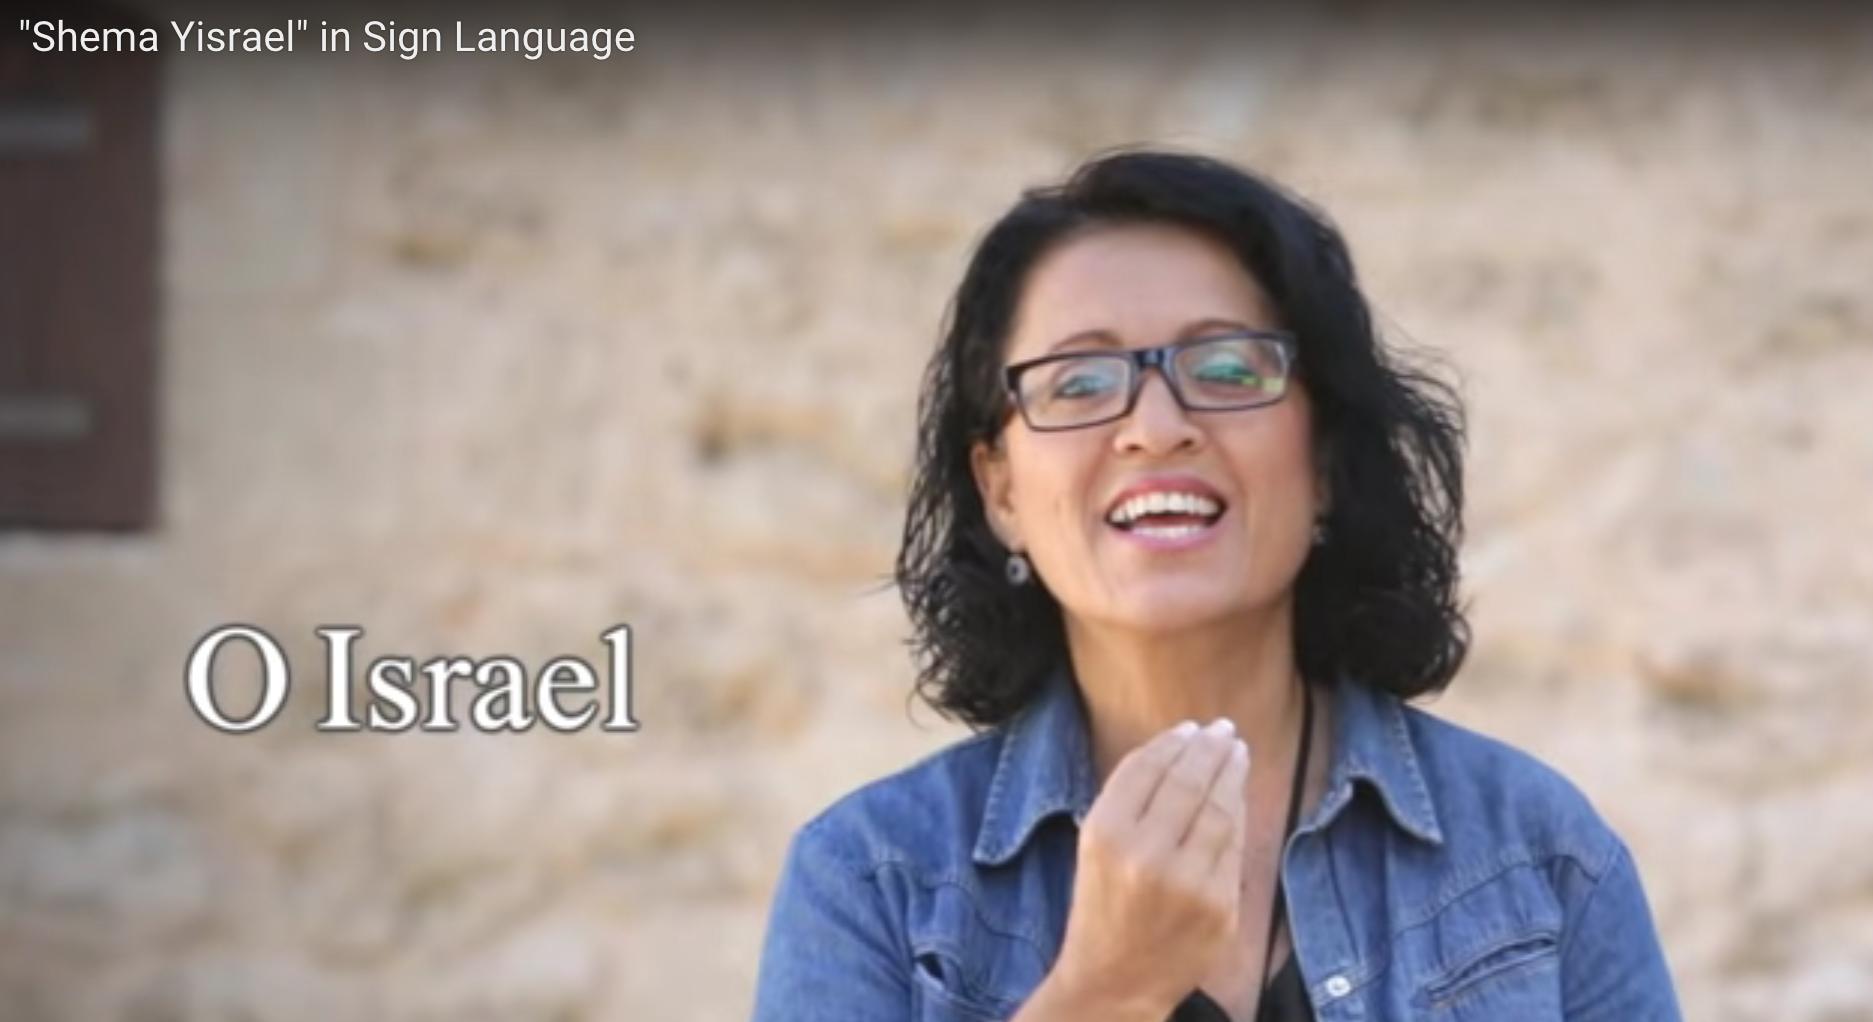 """Shema Yisrael"" in sign language."